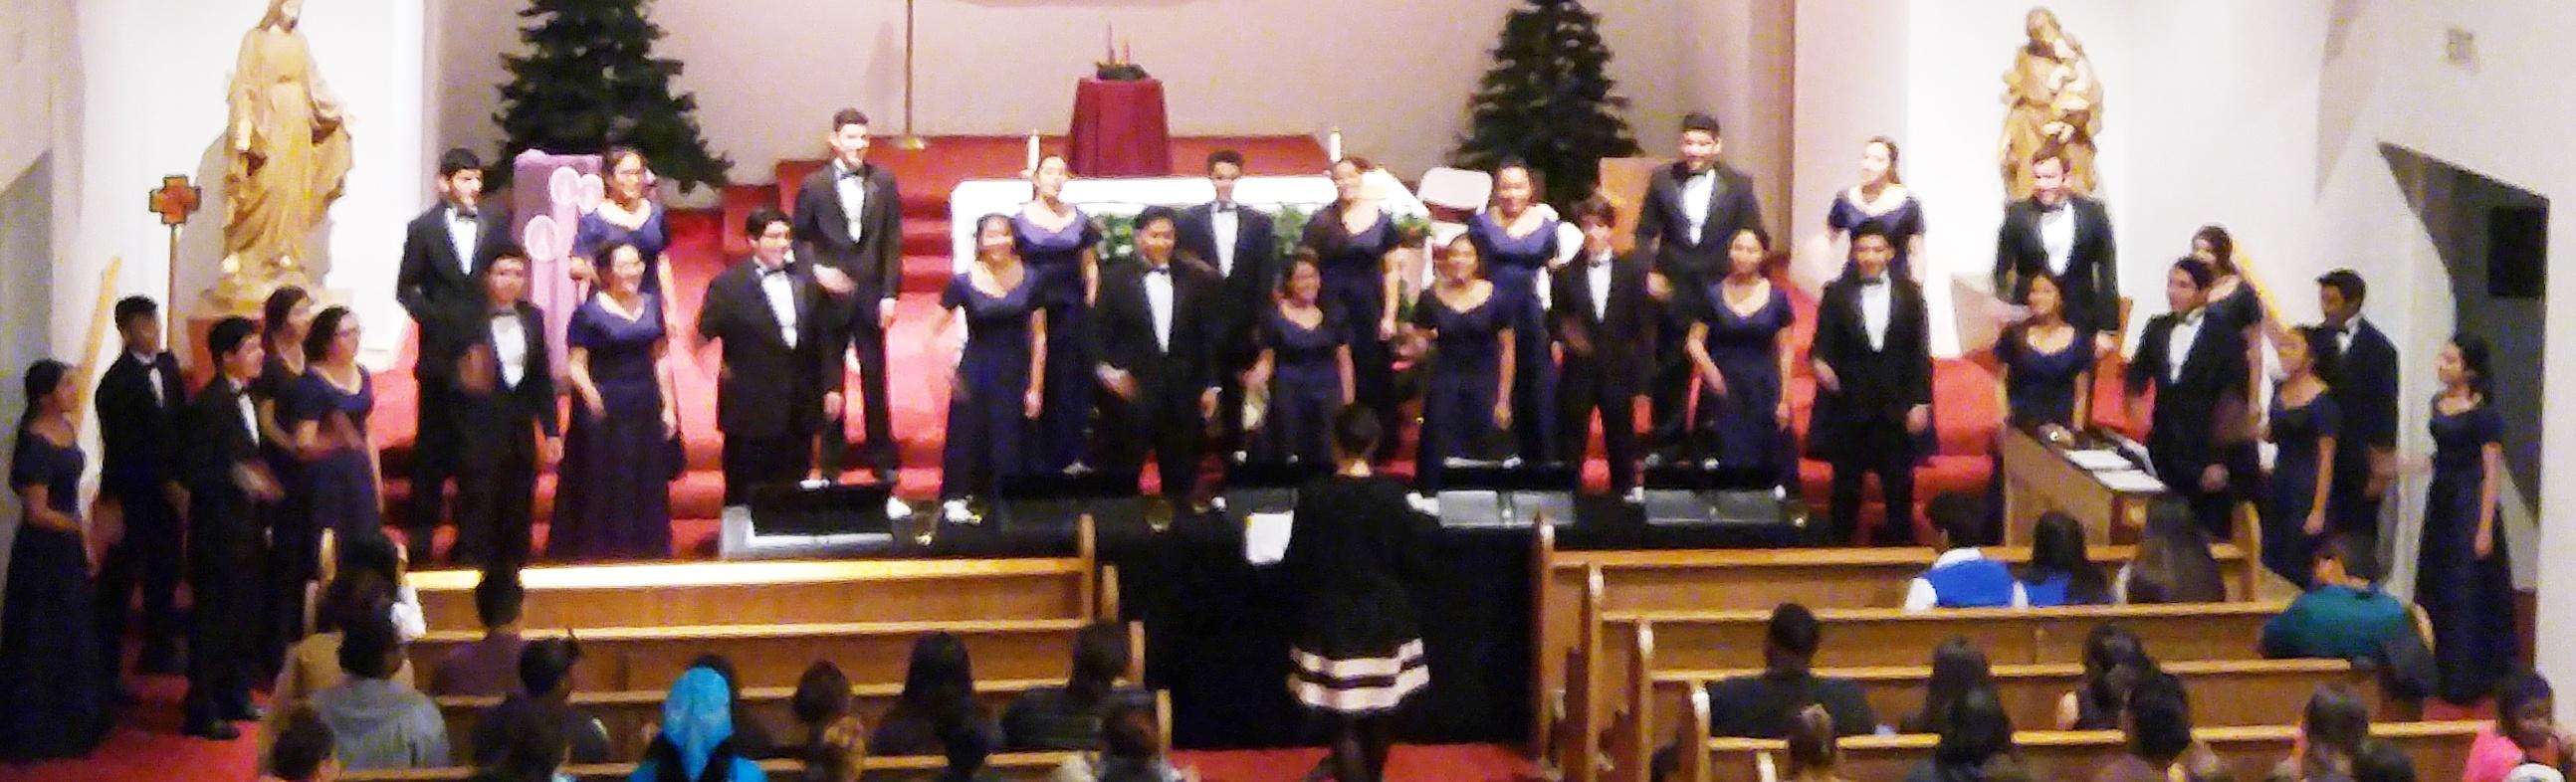 Bishop Amat Choir (1).jpg